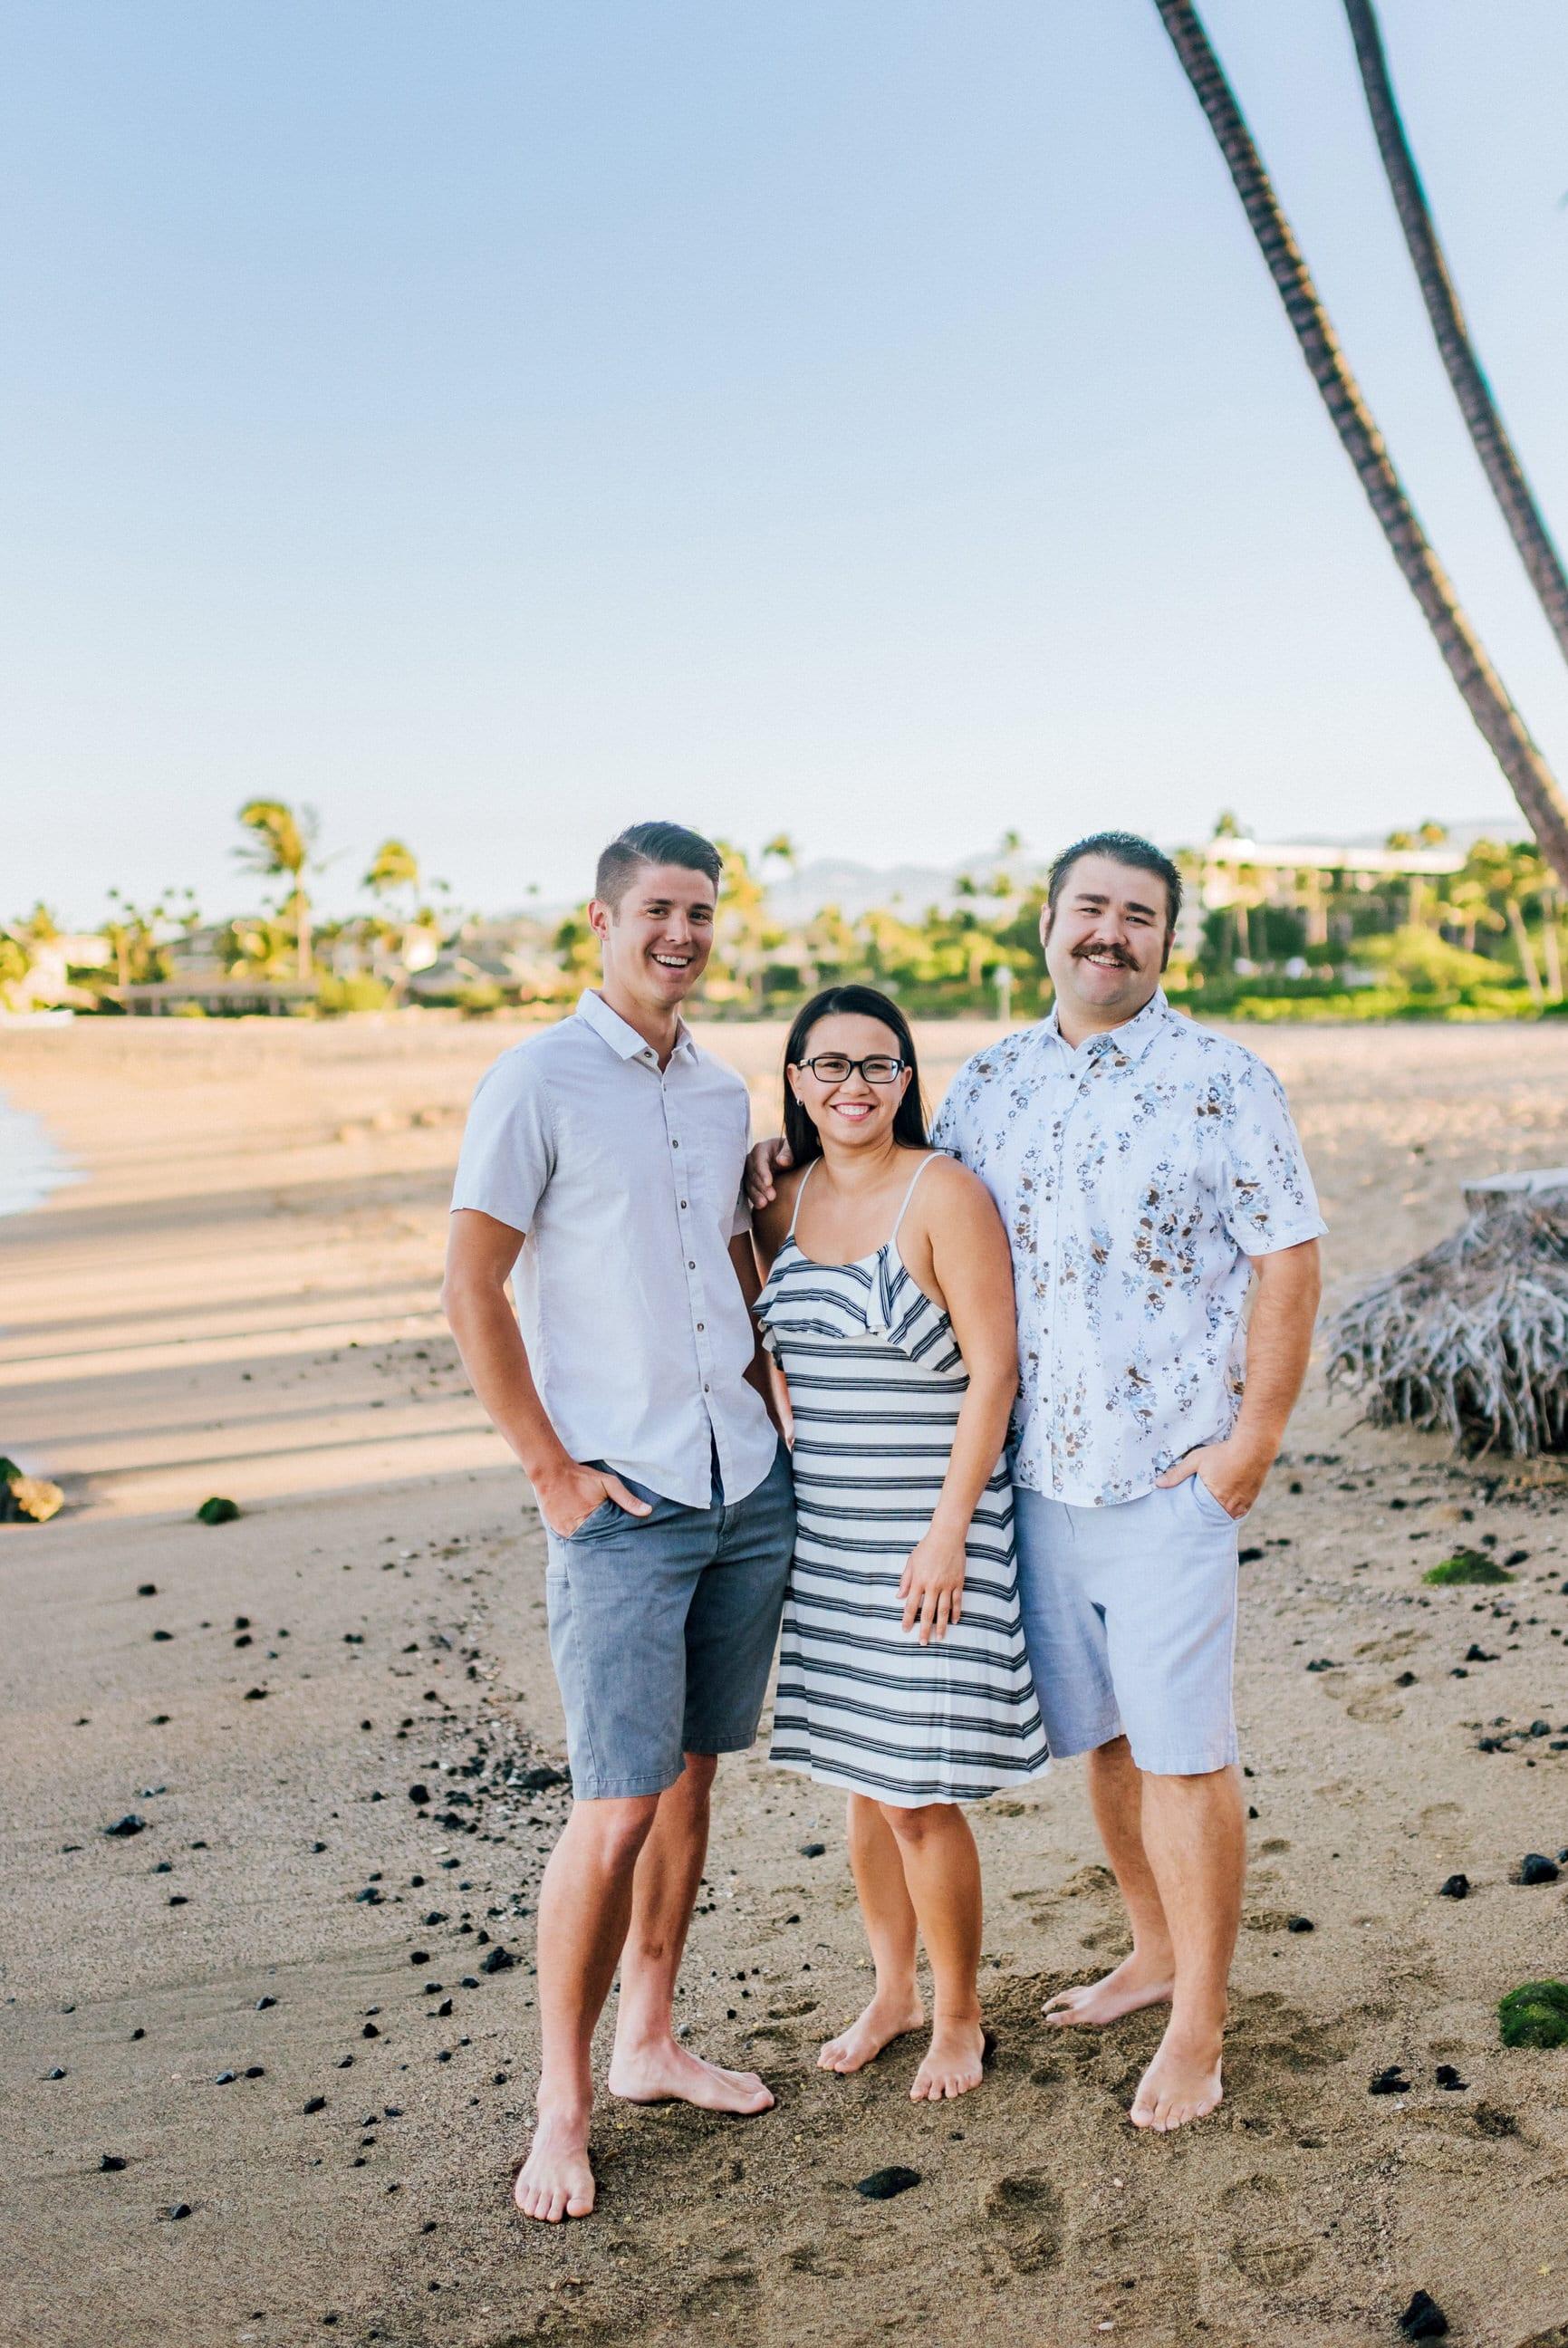 Big-Island-Family-Photographer-8.jpg